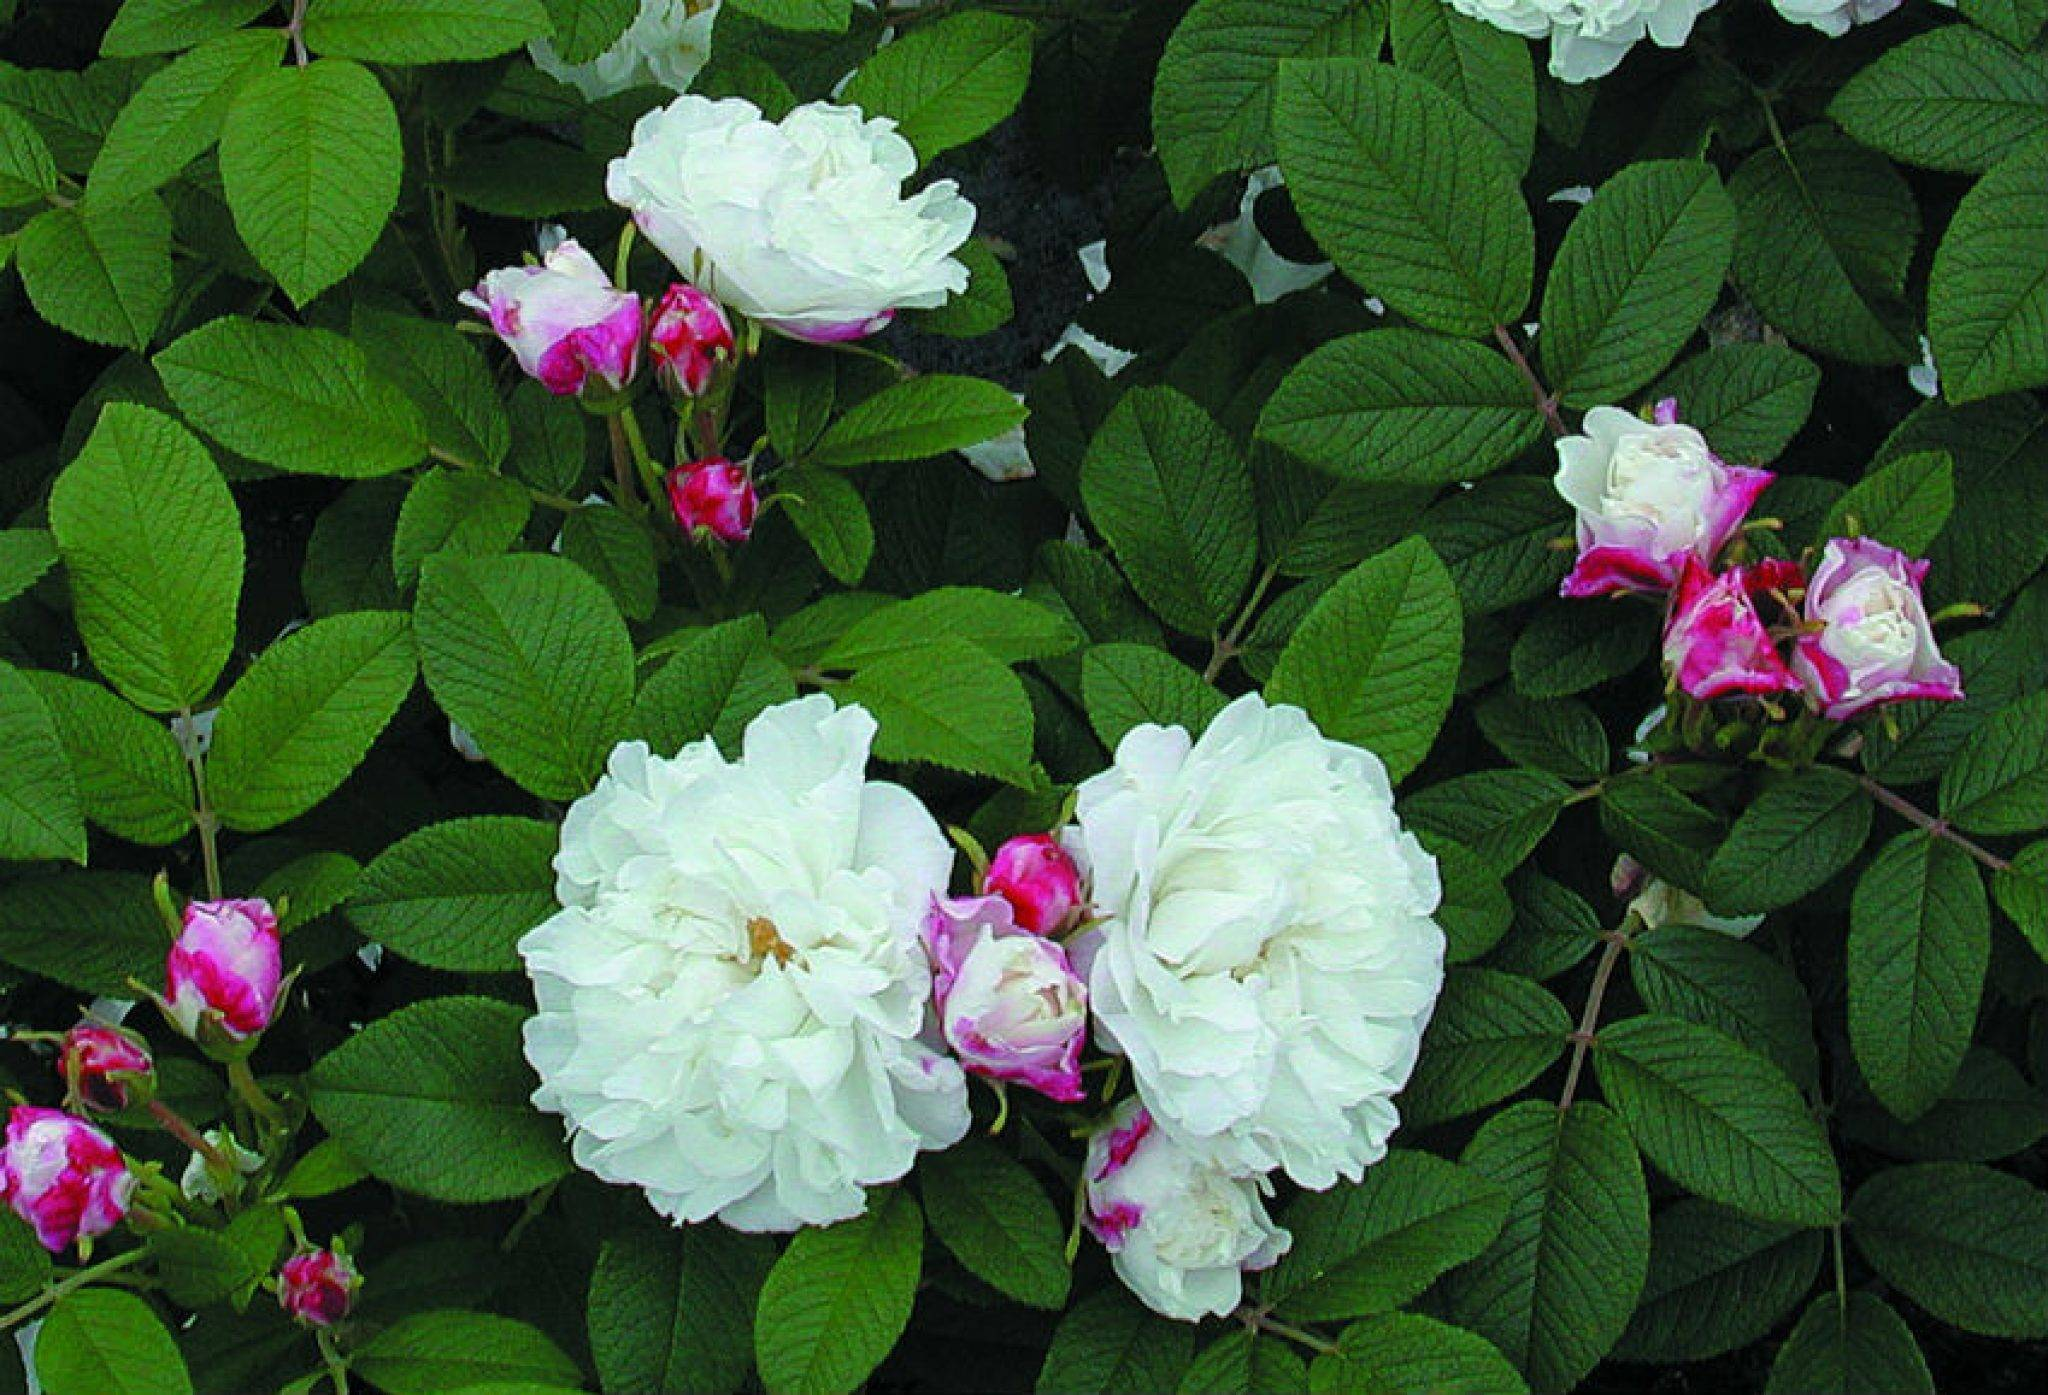 Канадские парковые розы (37 фото): «луиза багнет» и «мартин фробишер», «прайри джой» и «аделаида худлесс», «катберт грант» и «александр маккензи»